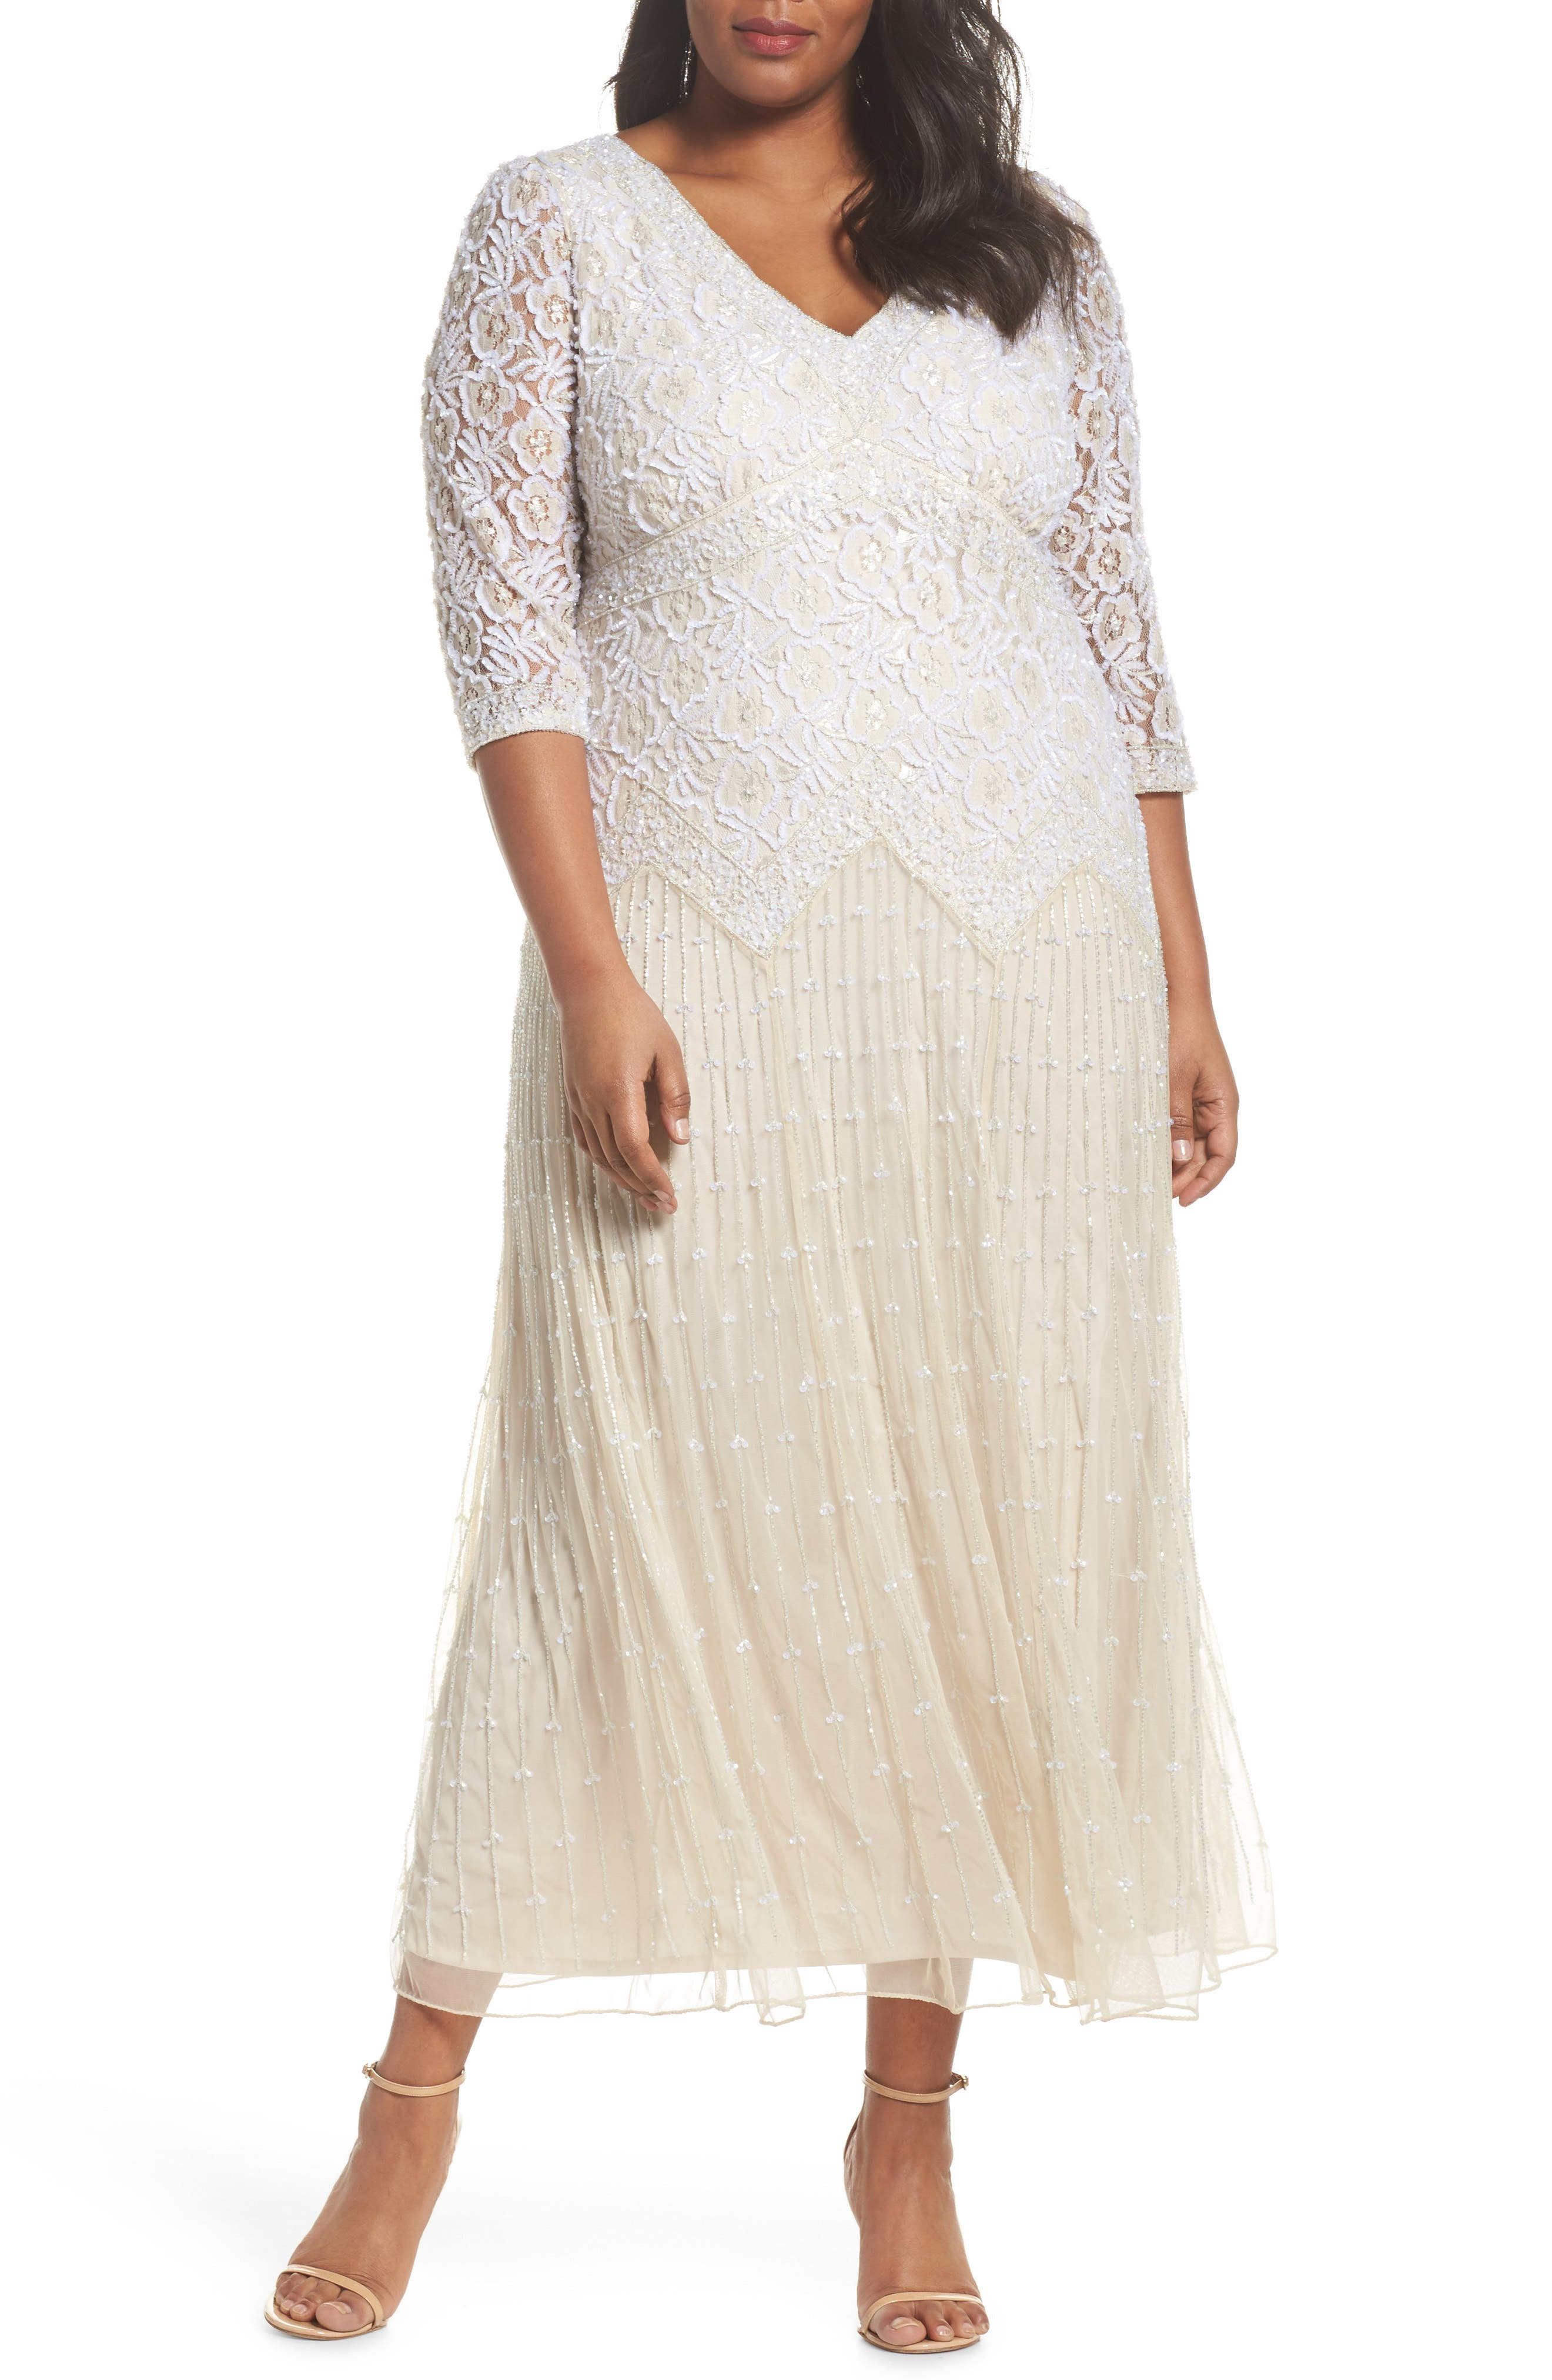 Vintage Inspired Wedding Dress | Vintage Style Wedding Dresses Plus Size Womens Pisarro Nights Beaded V-Neck Lace Illusion Gown $142.80 AT vintagedancer.com